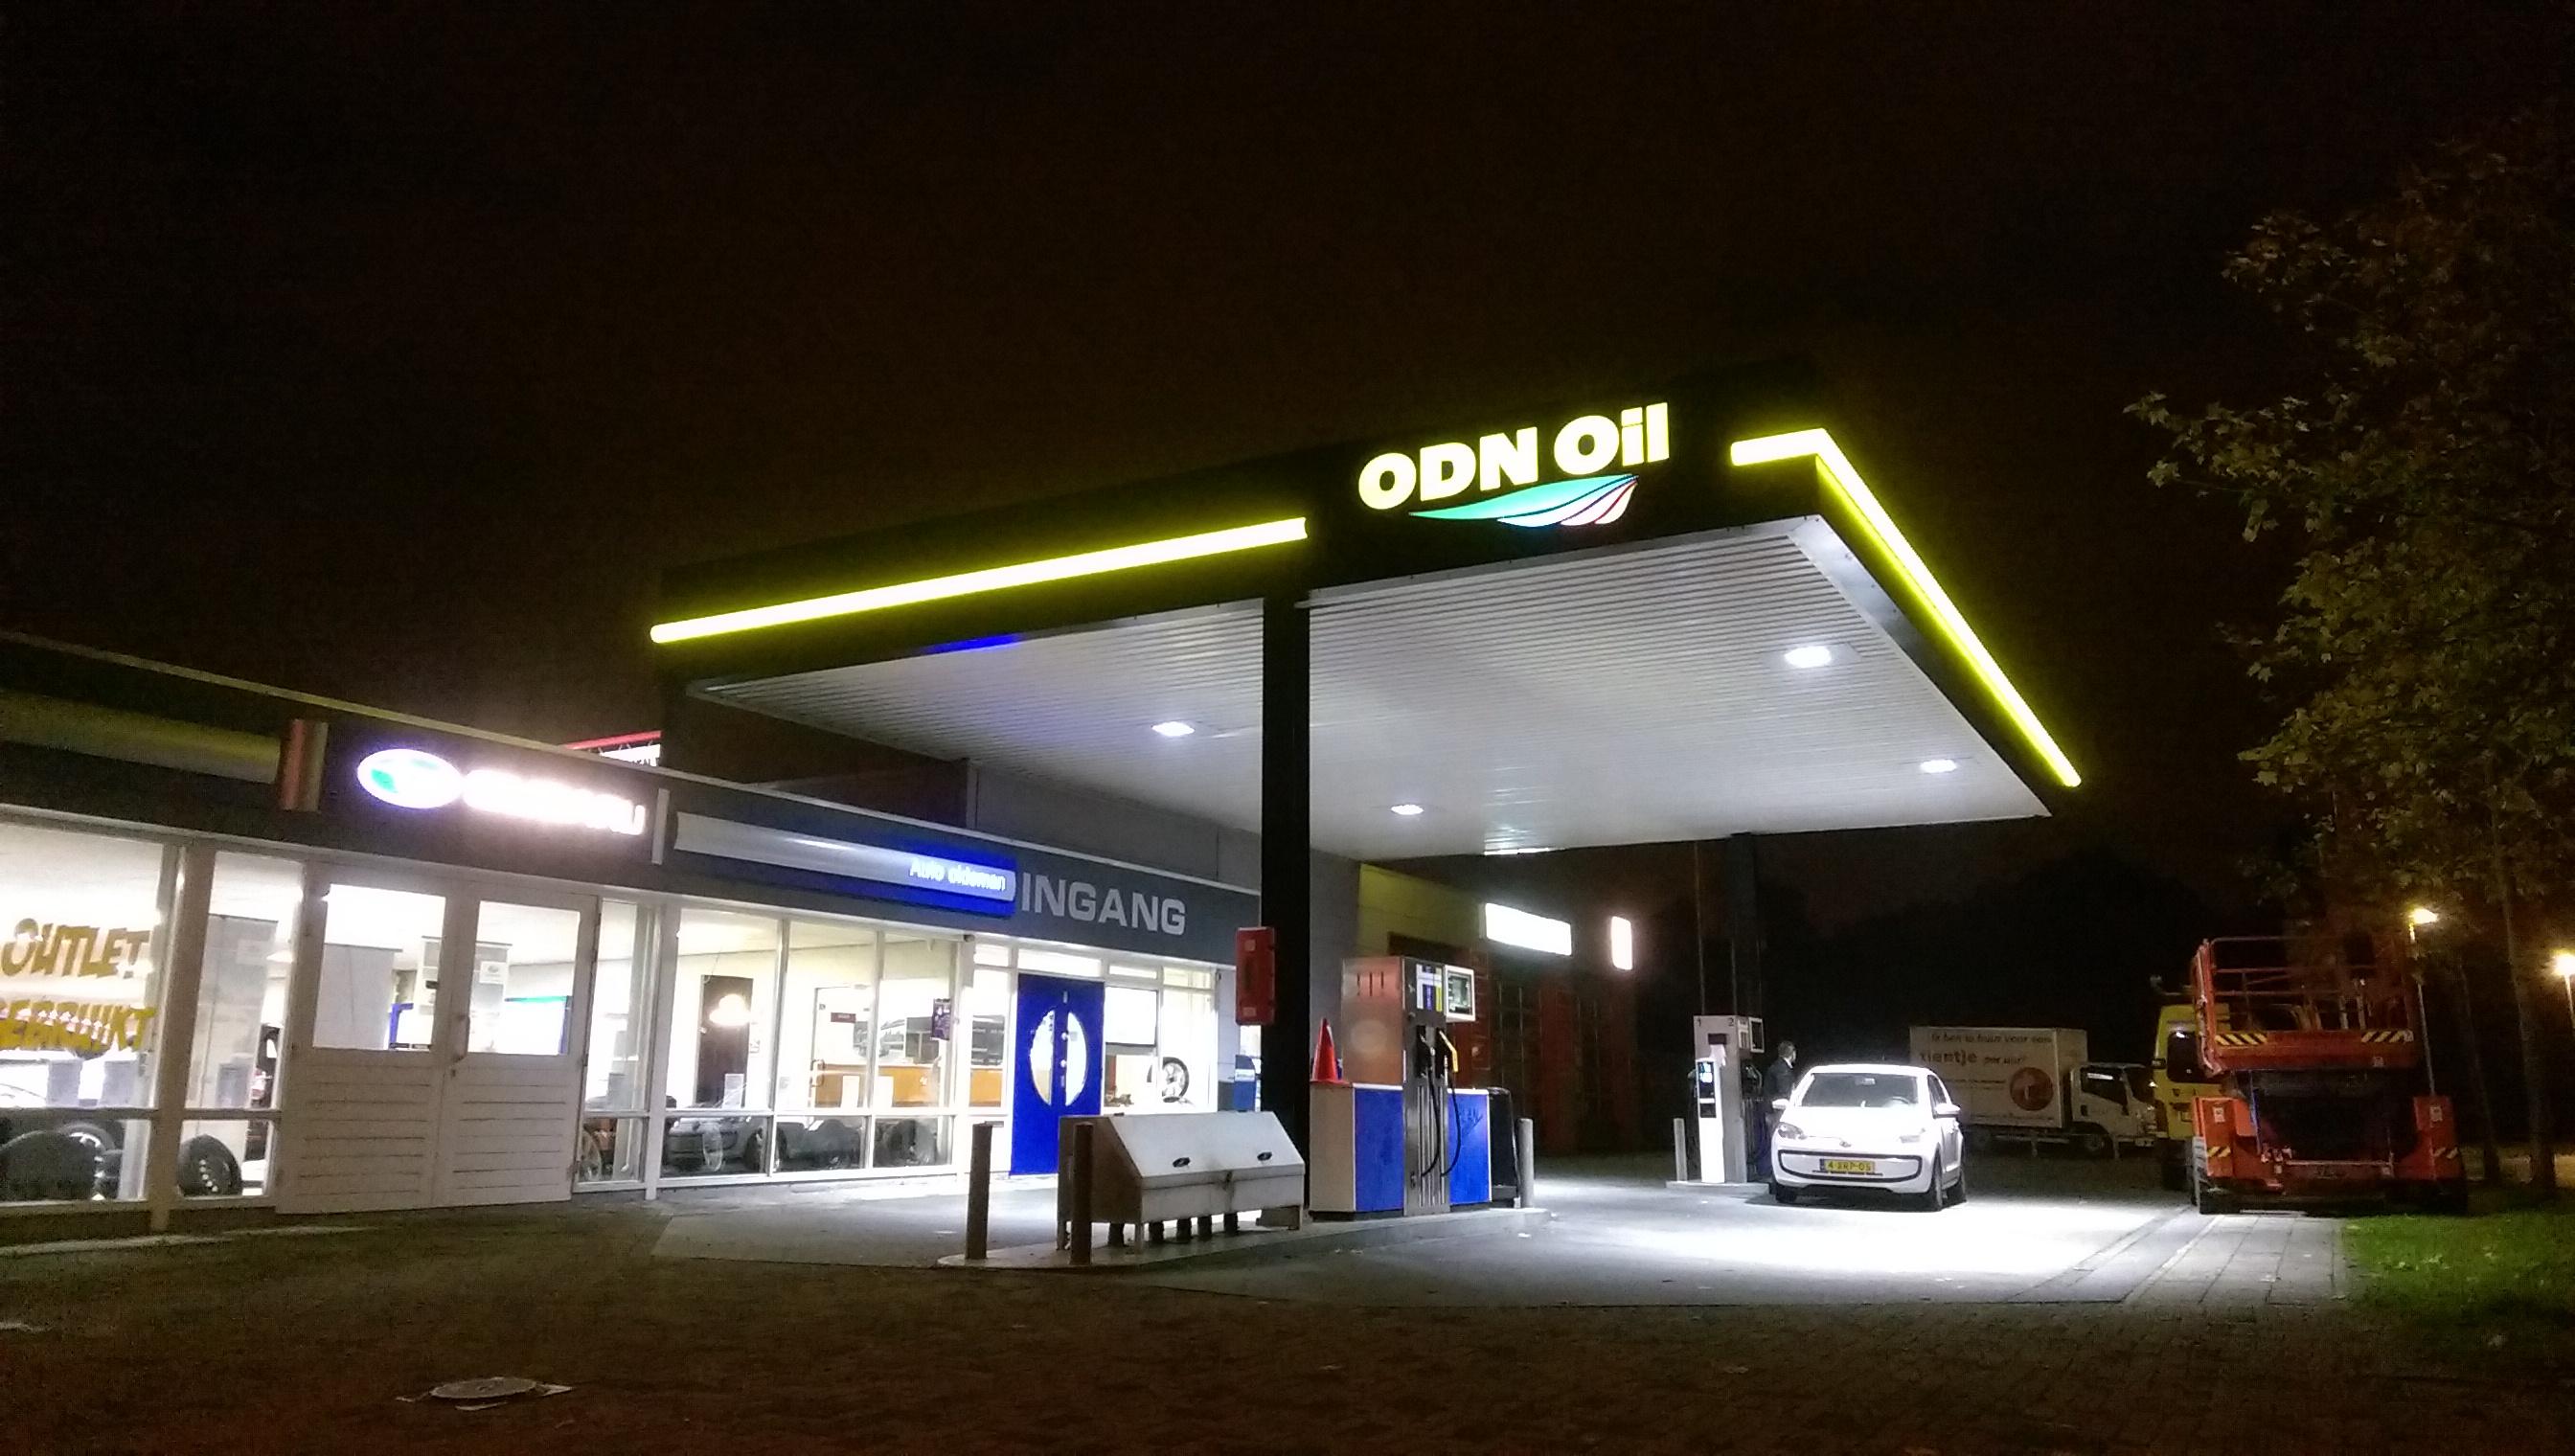 Boeiboorden – ODN Boeiboord Akeleiweg Groningen